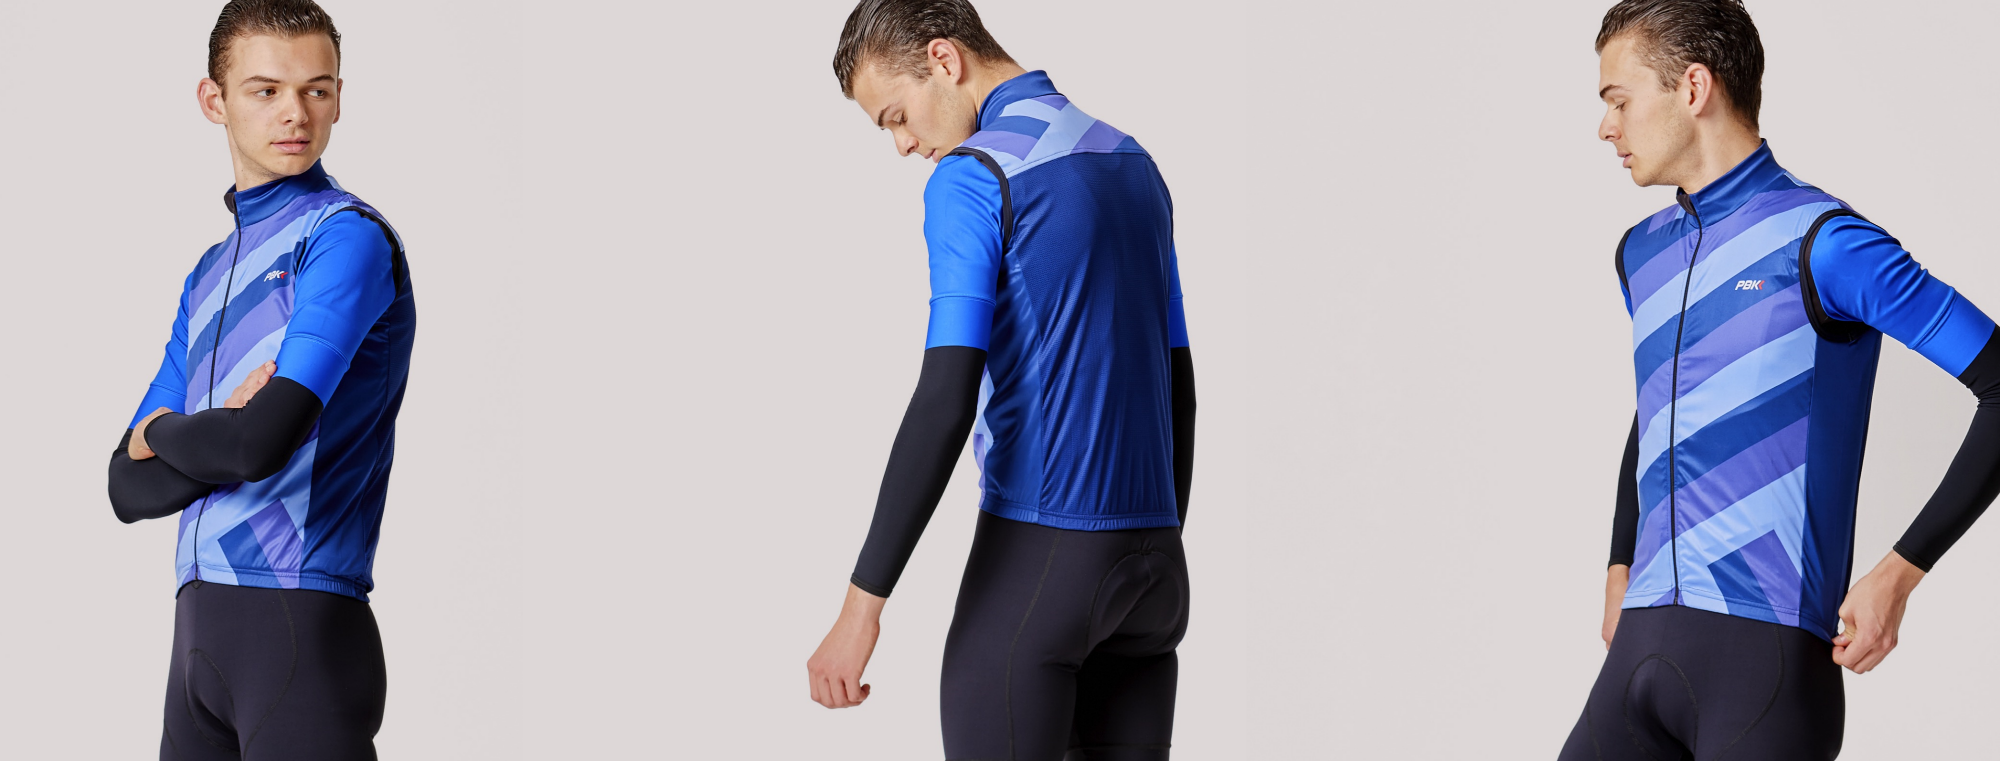 PBK clothing Capra gilet in blue